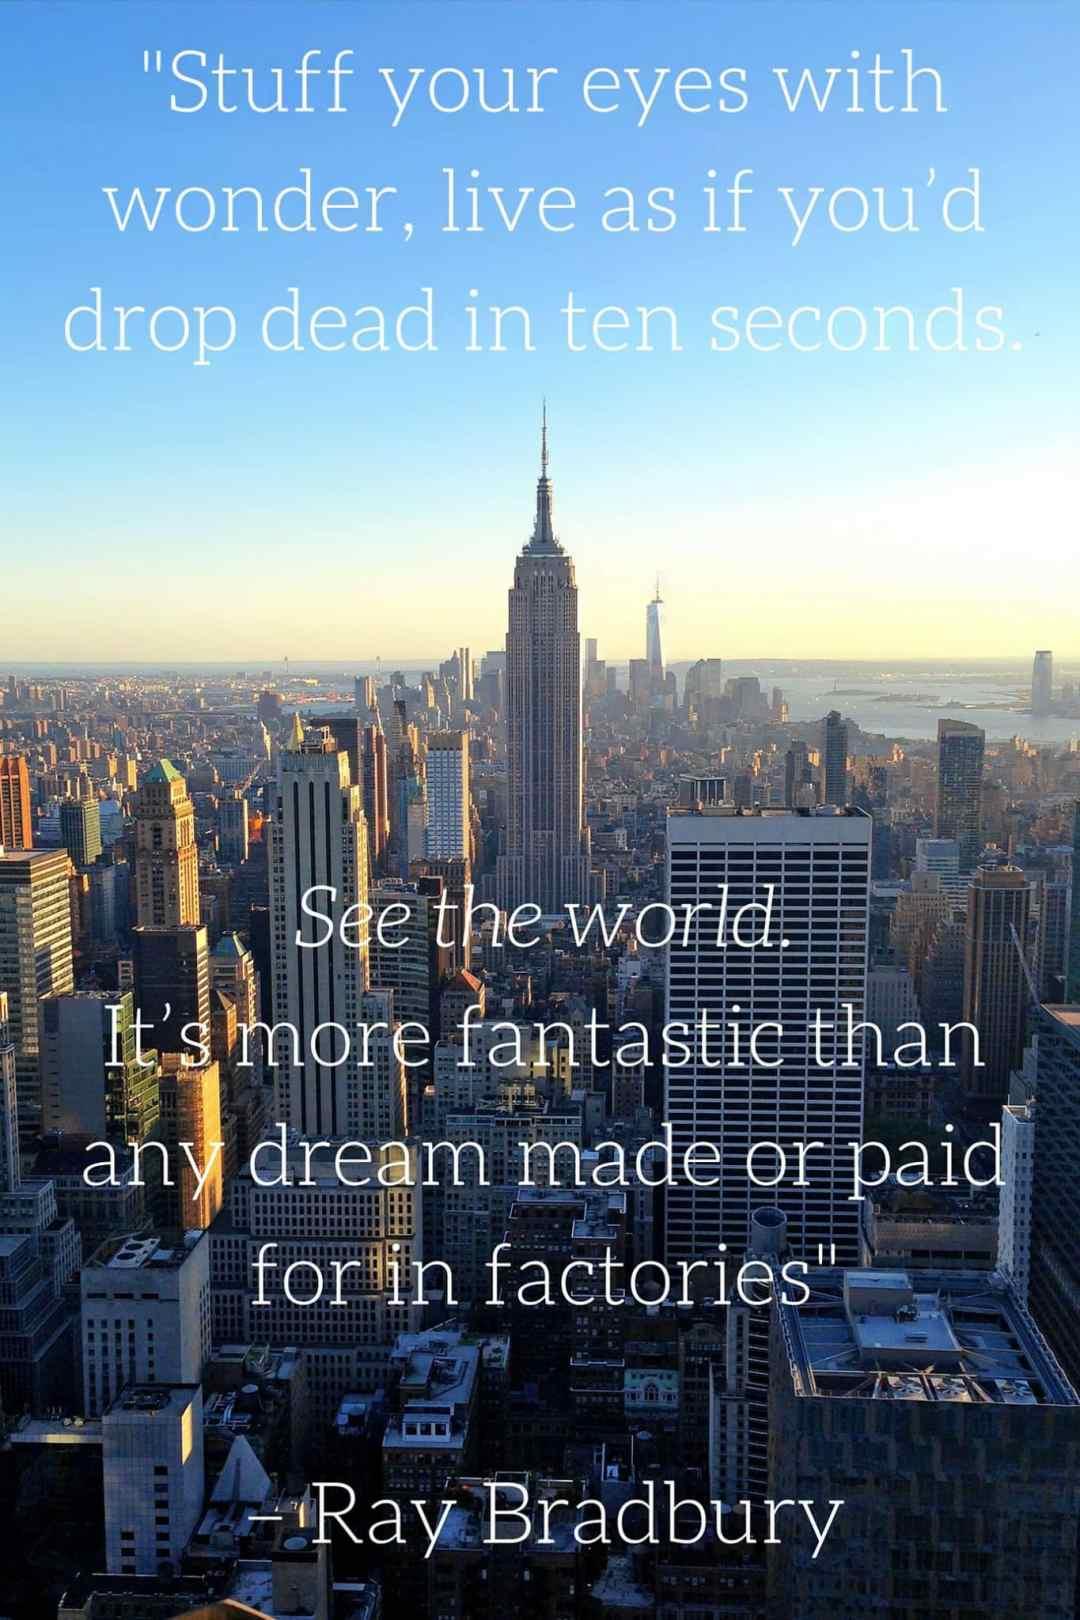 travel quotes inspirational inspo